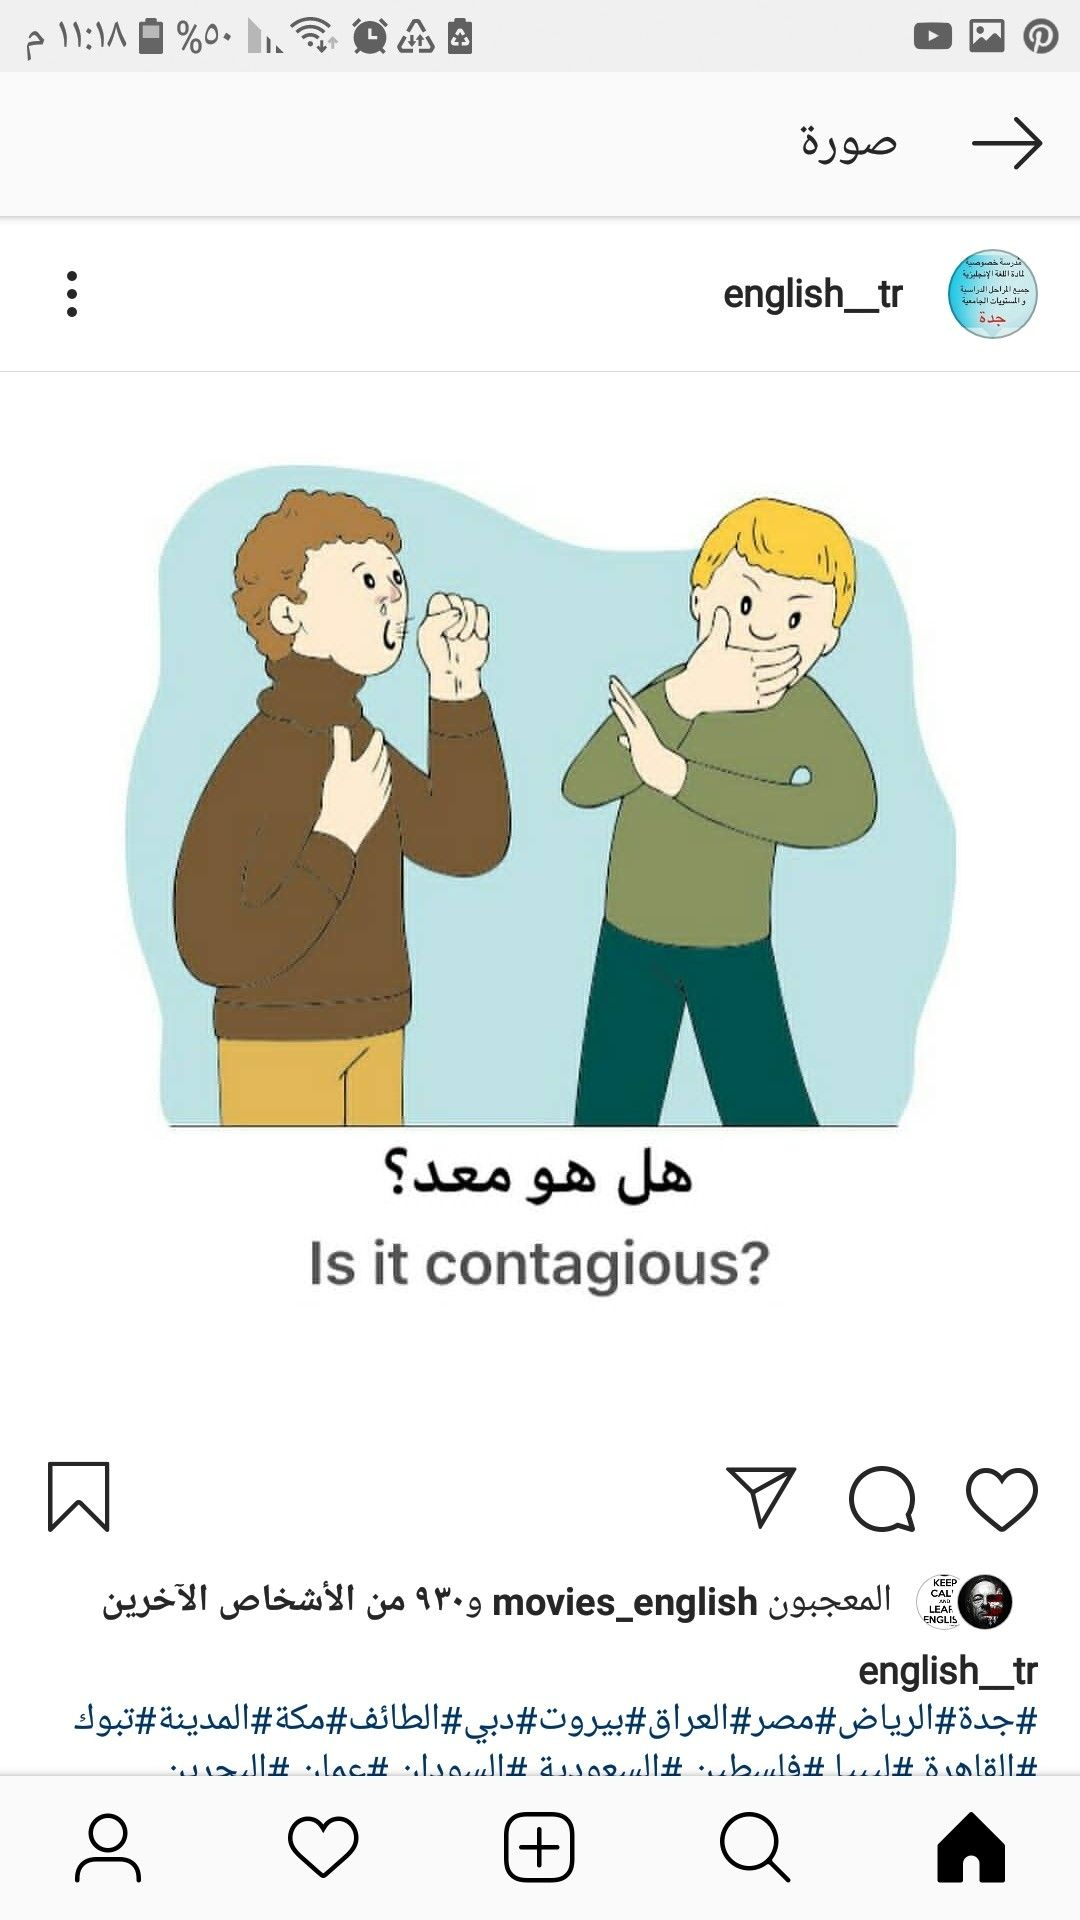 Learning Arabic Msa Fabiennem English Language Learning Grammar English Phrases Learn English Vocabulary